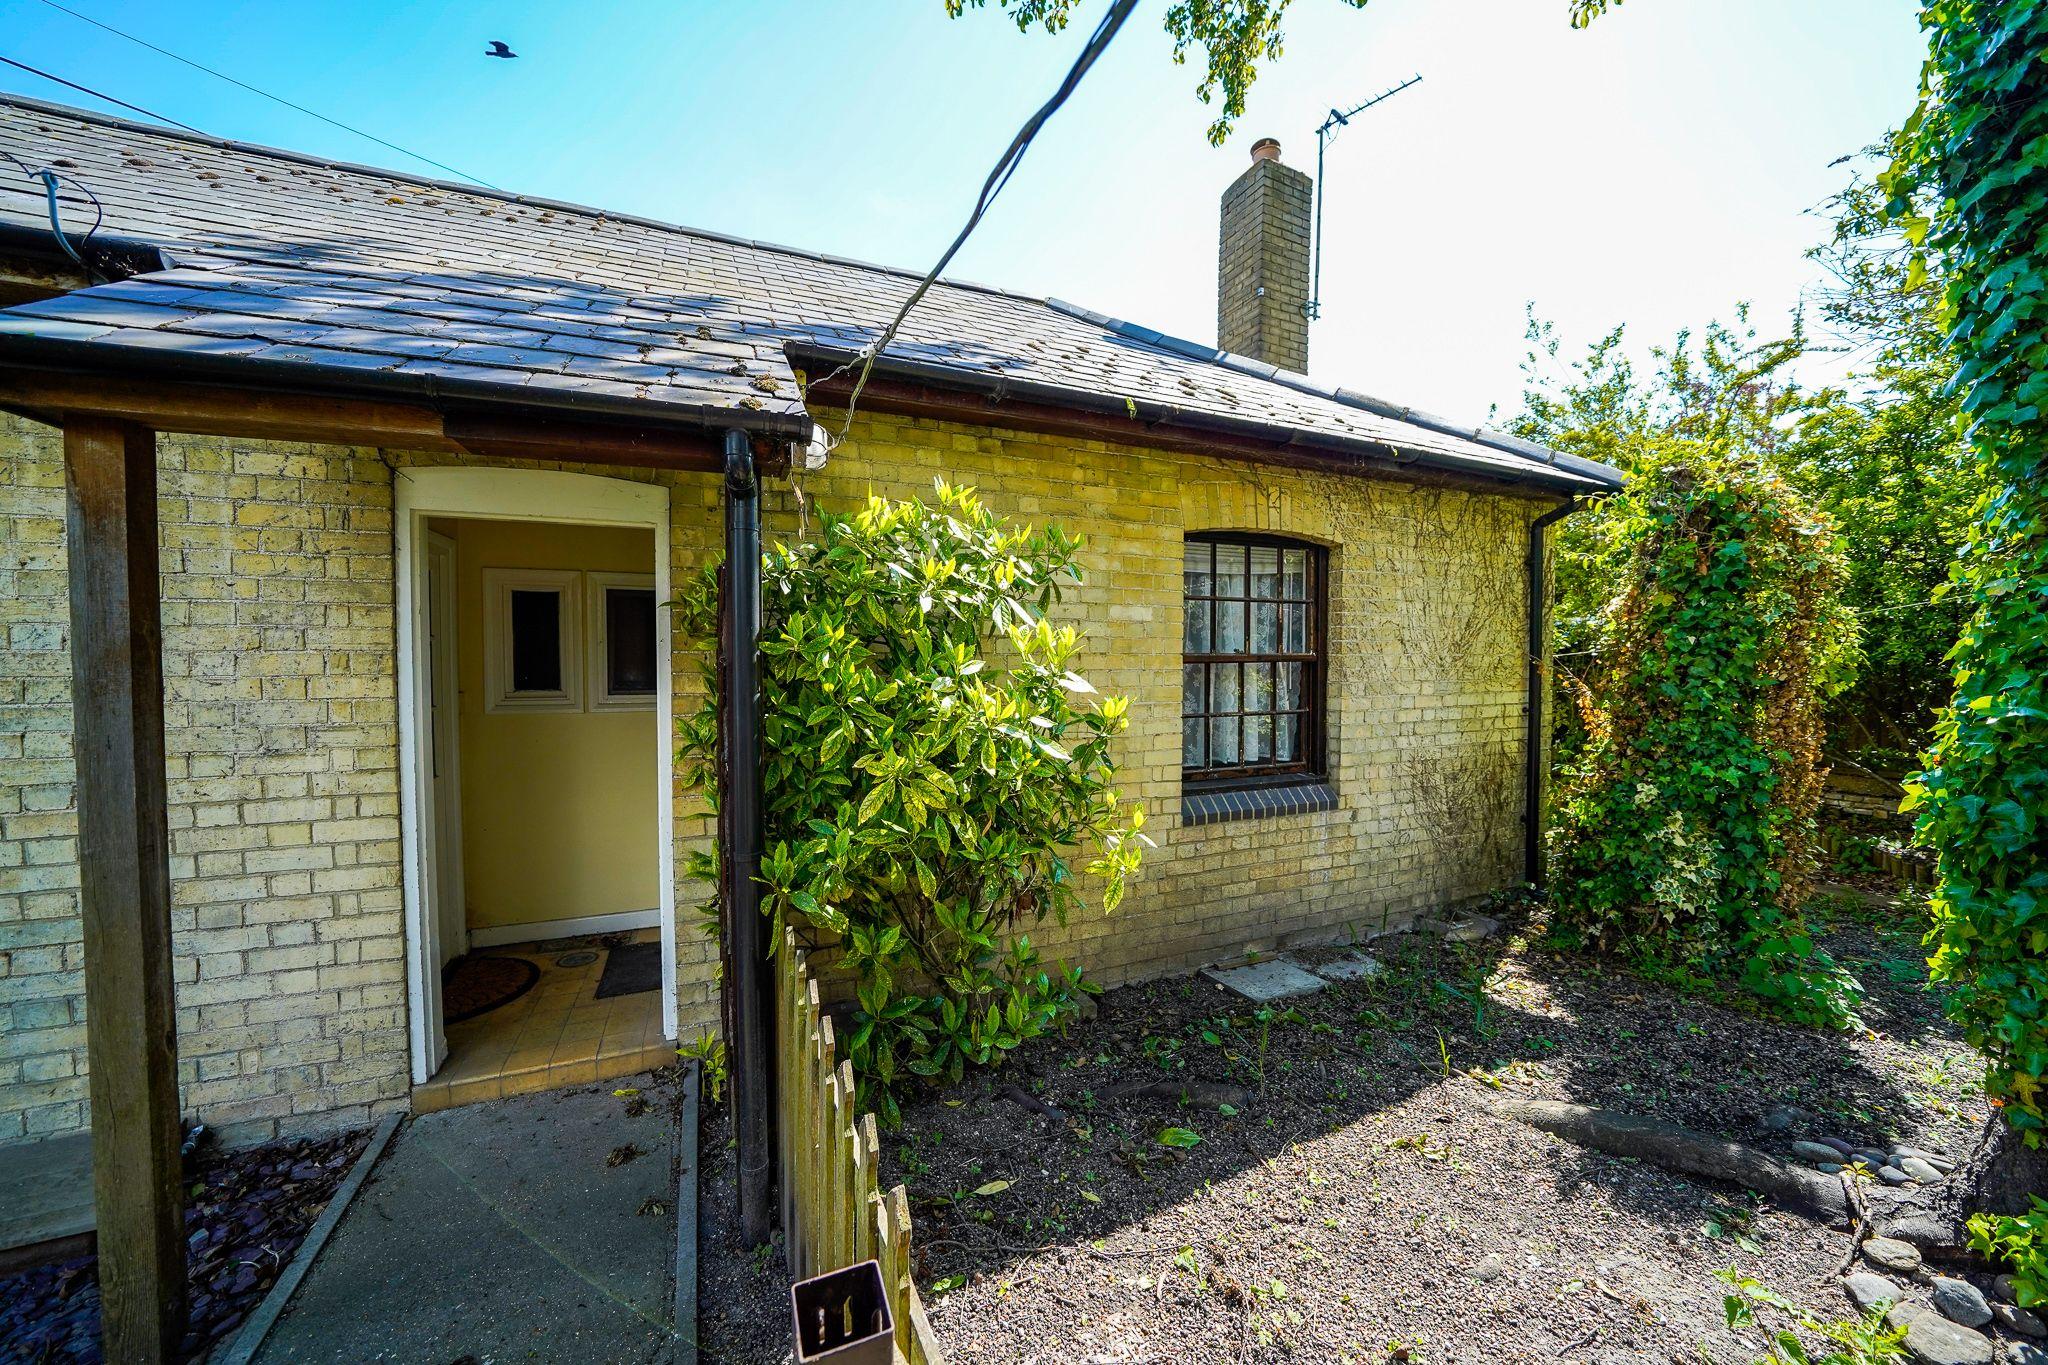 Property photo 1 of 7.